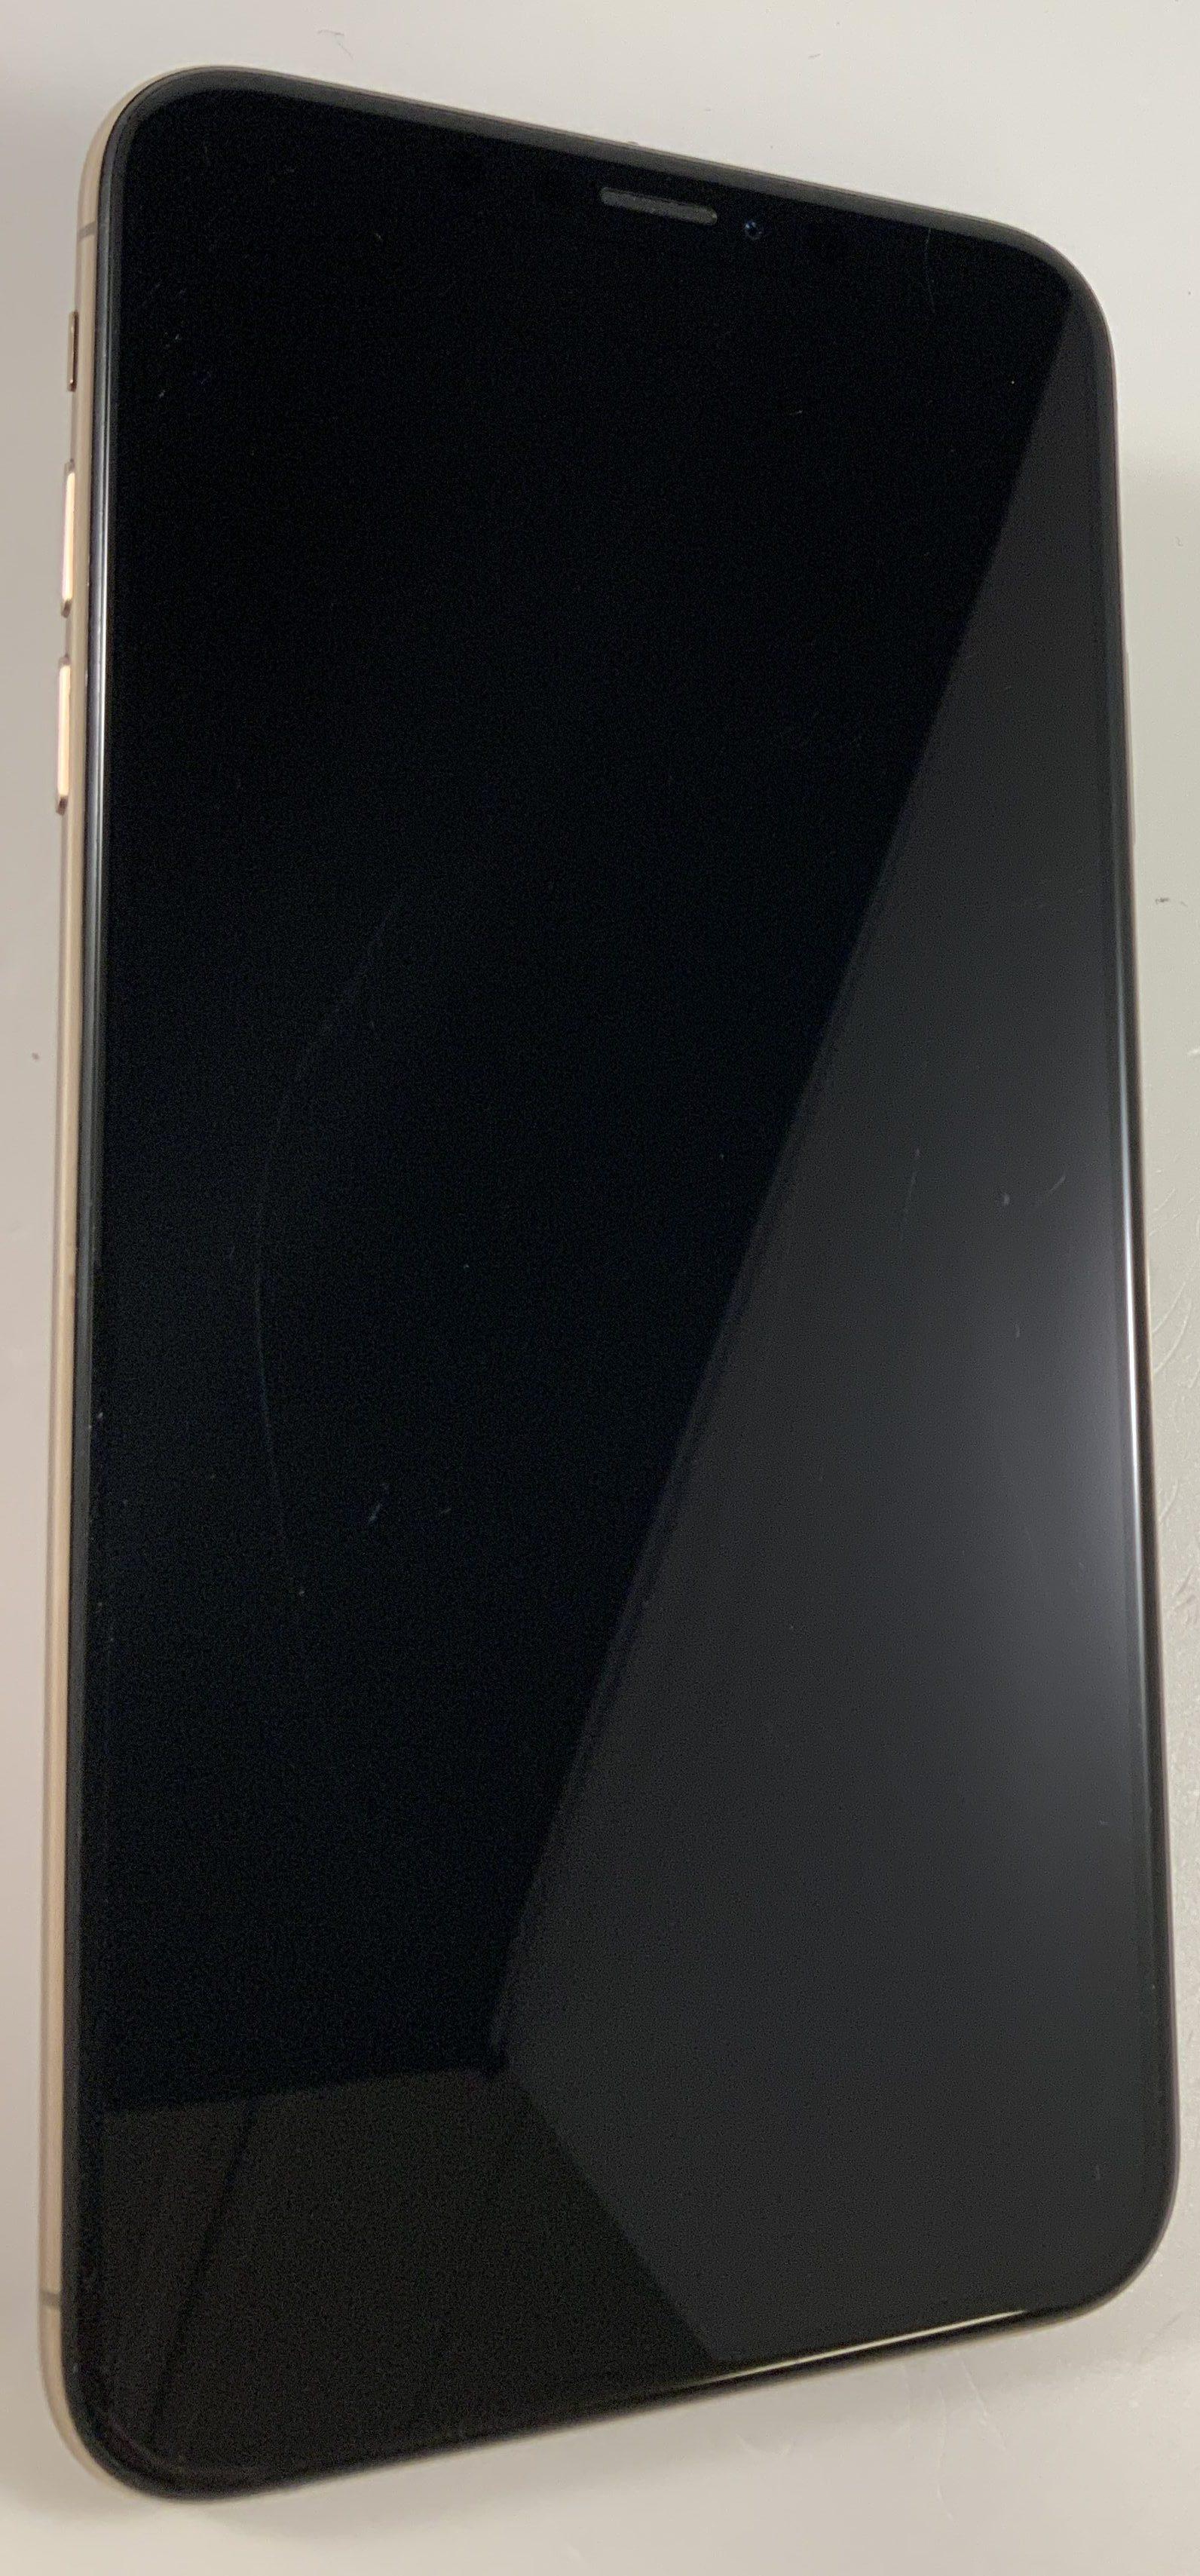 iPhone XS Max 64GB, 64GB, Gold, image 4